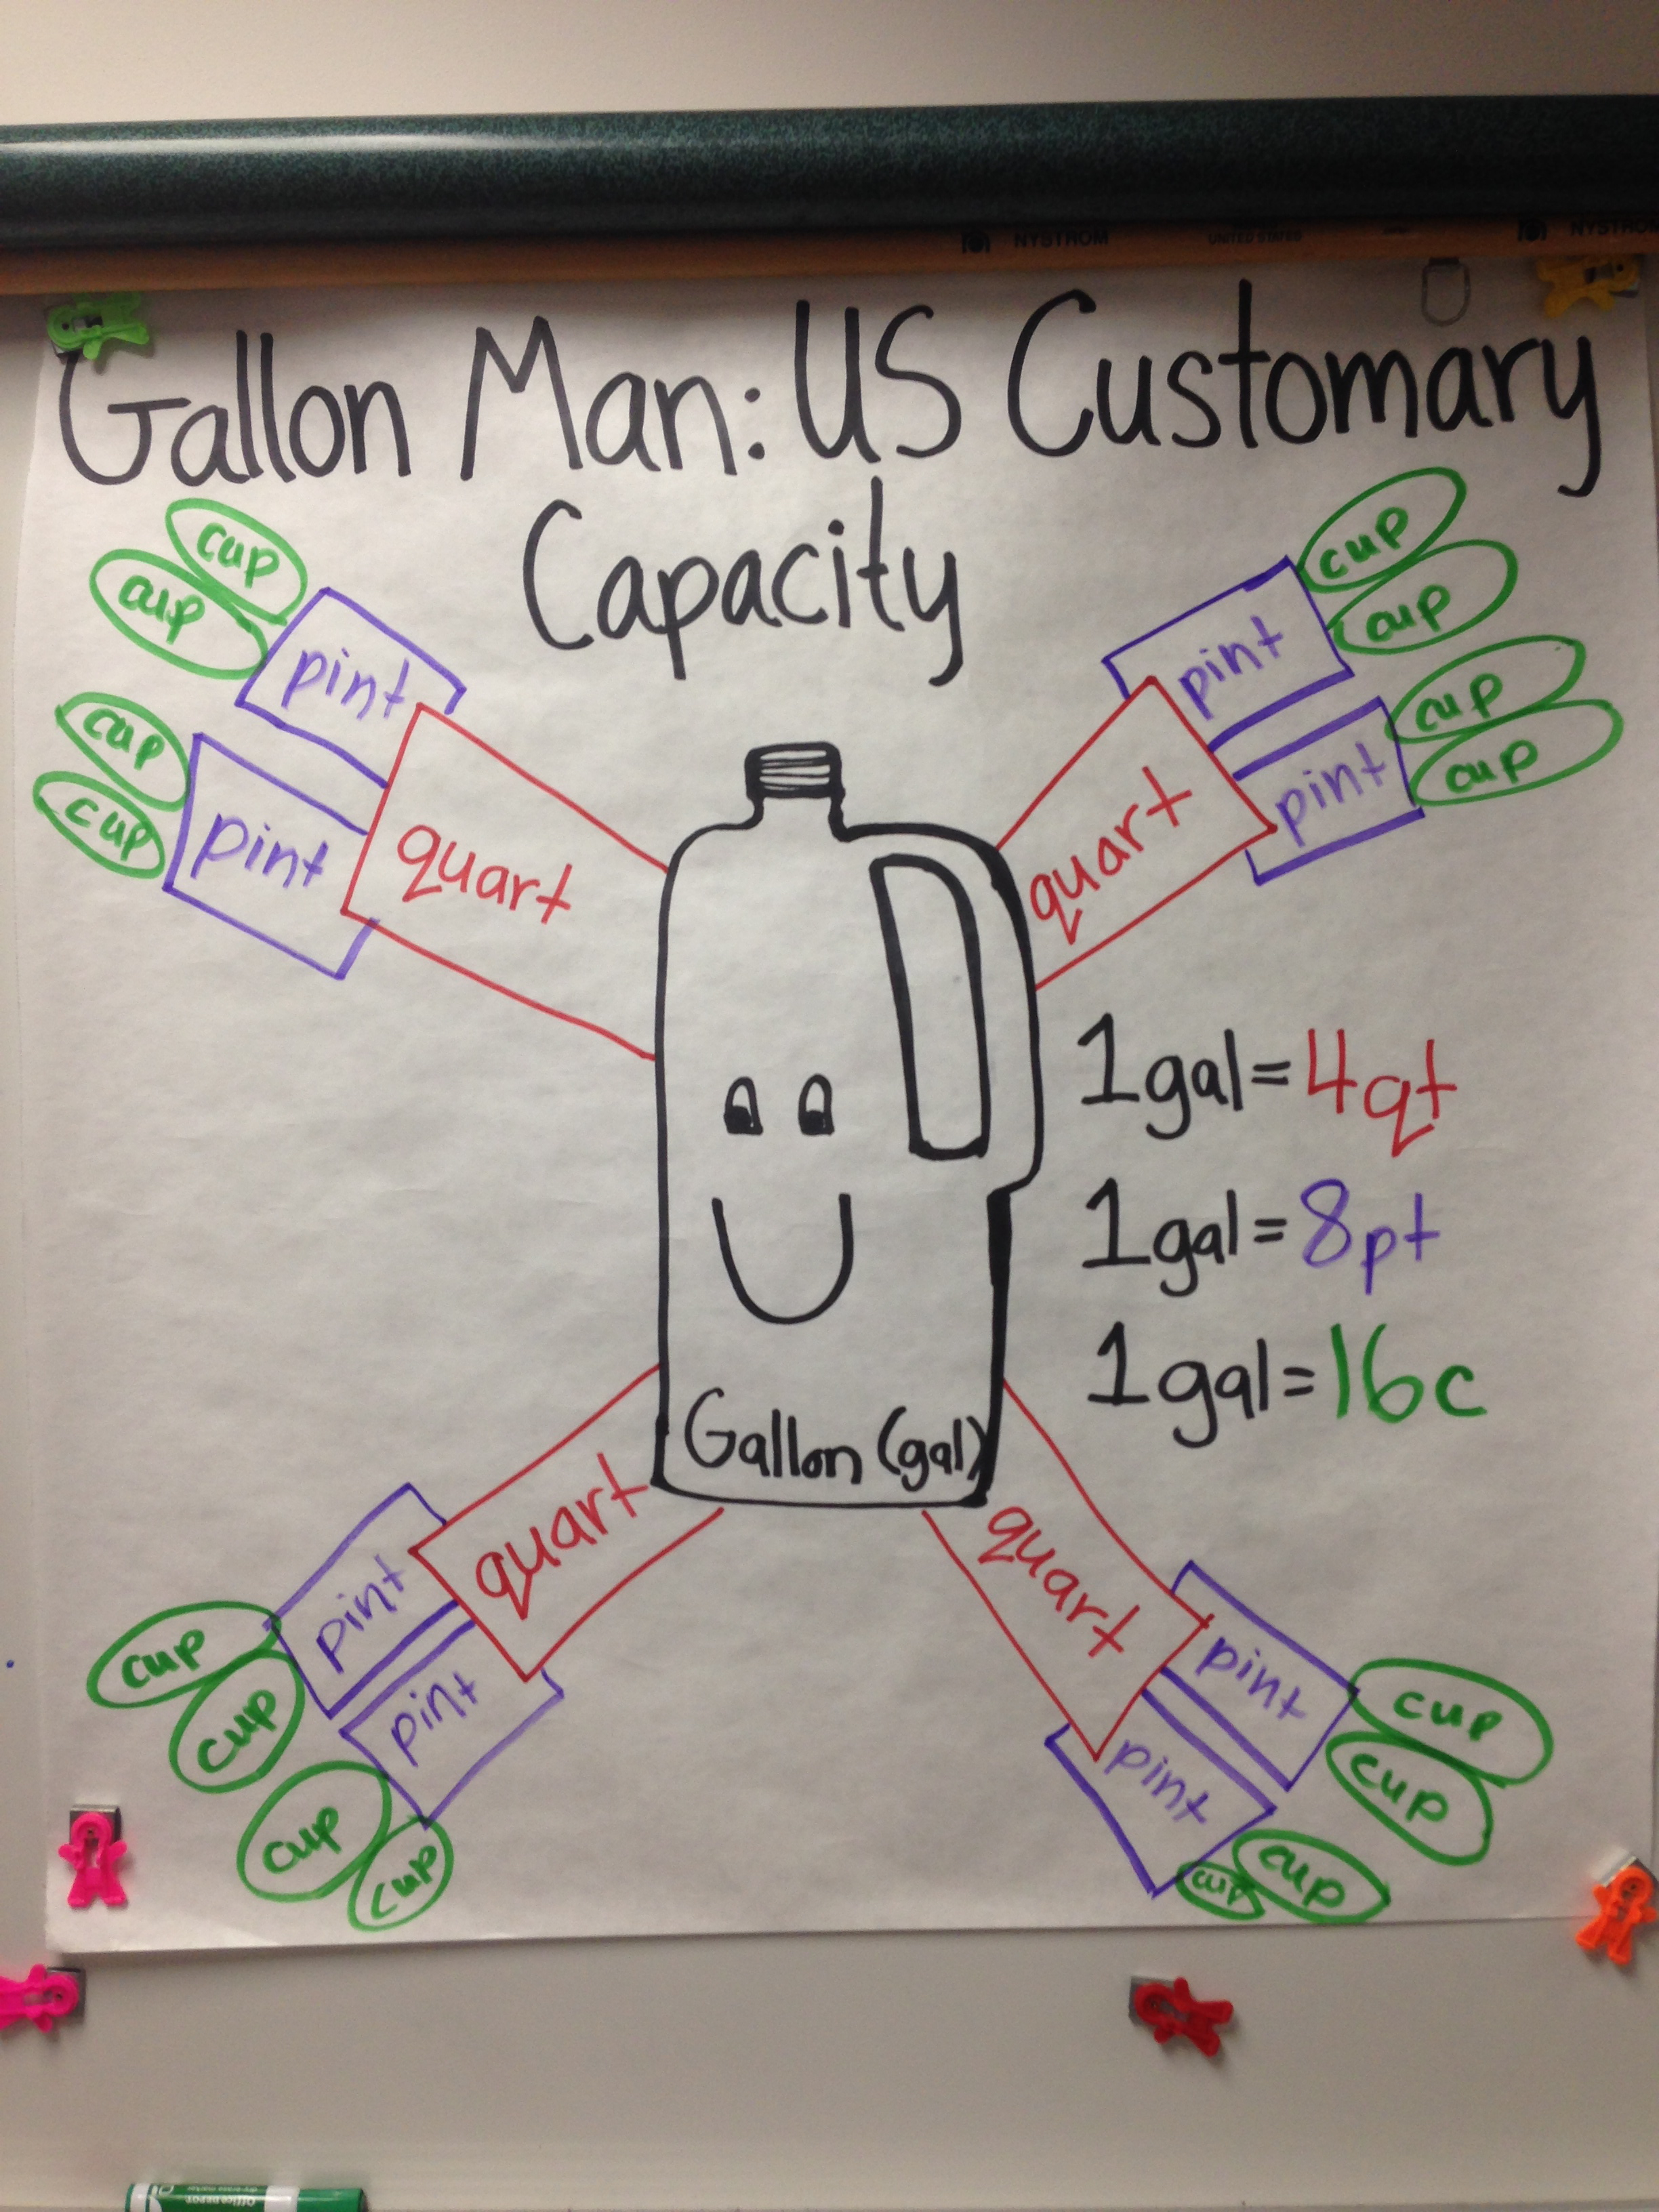 Metric Gallon Man